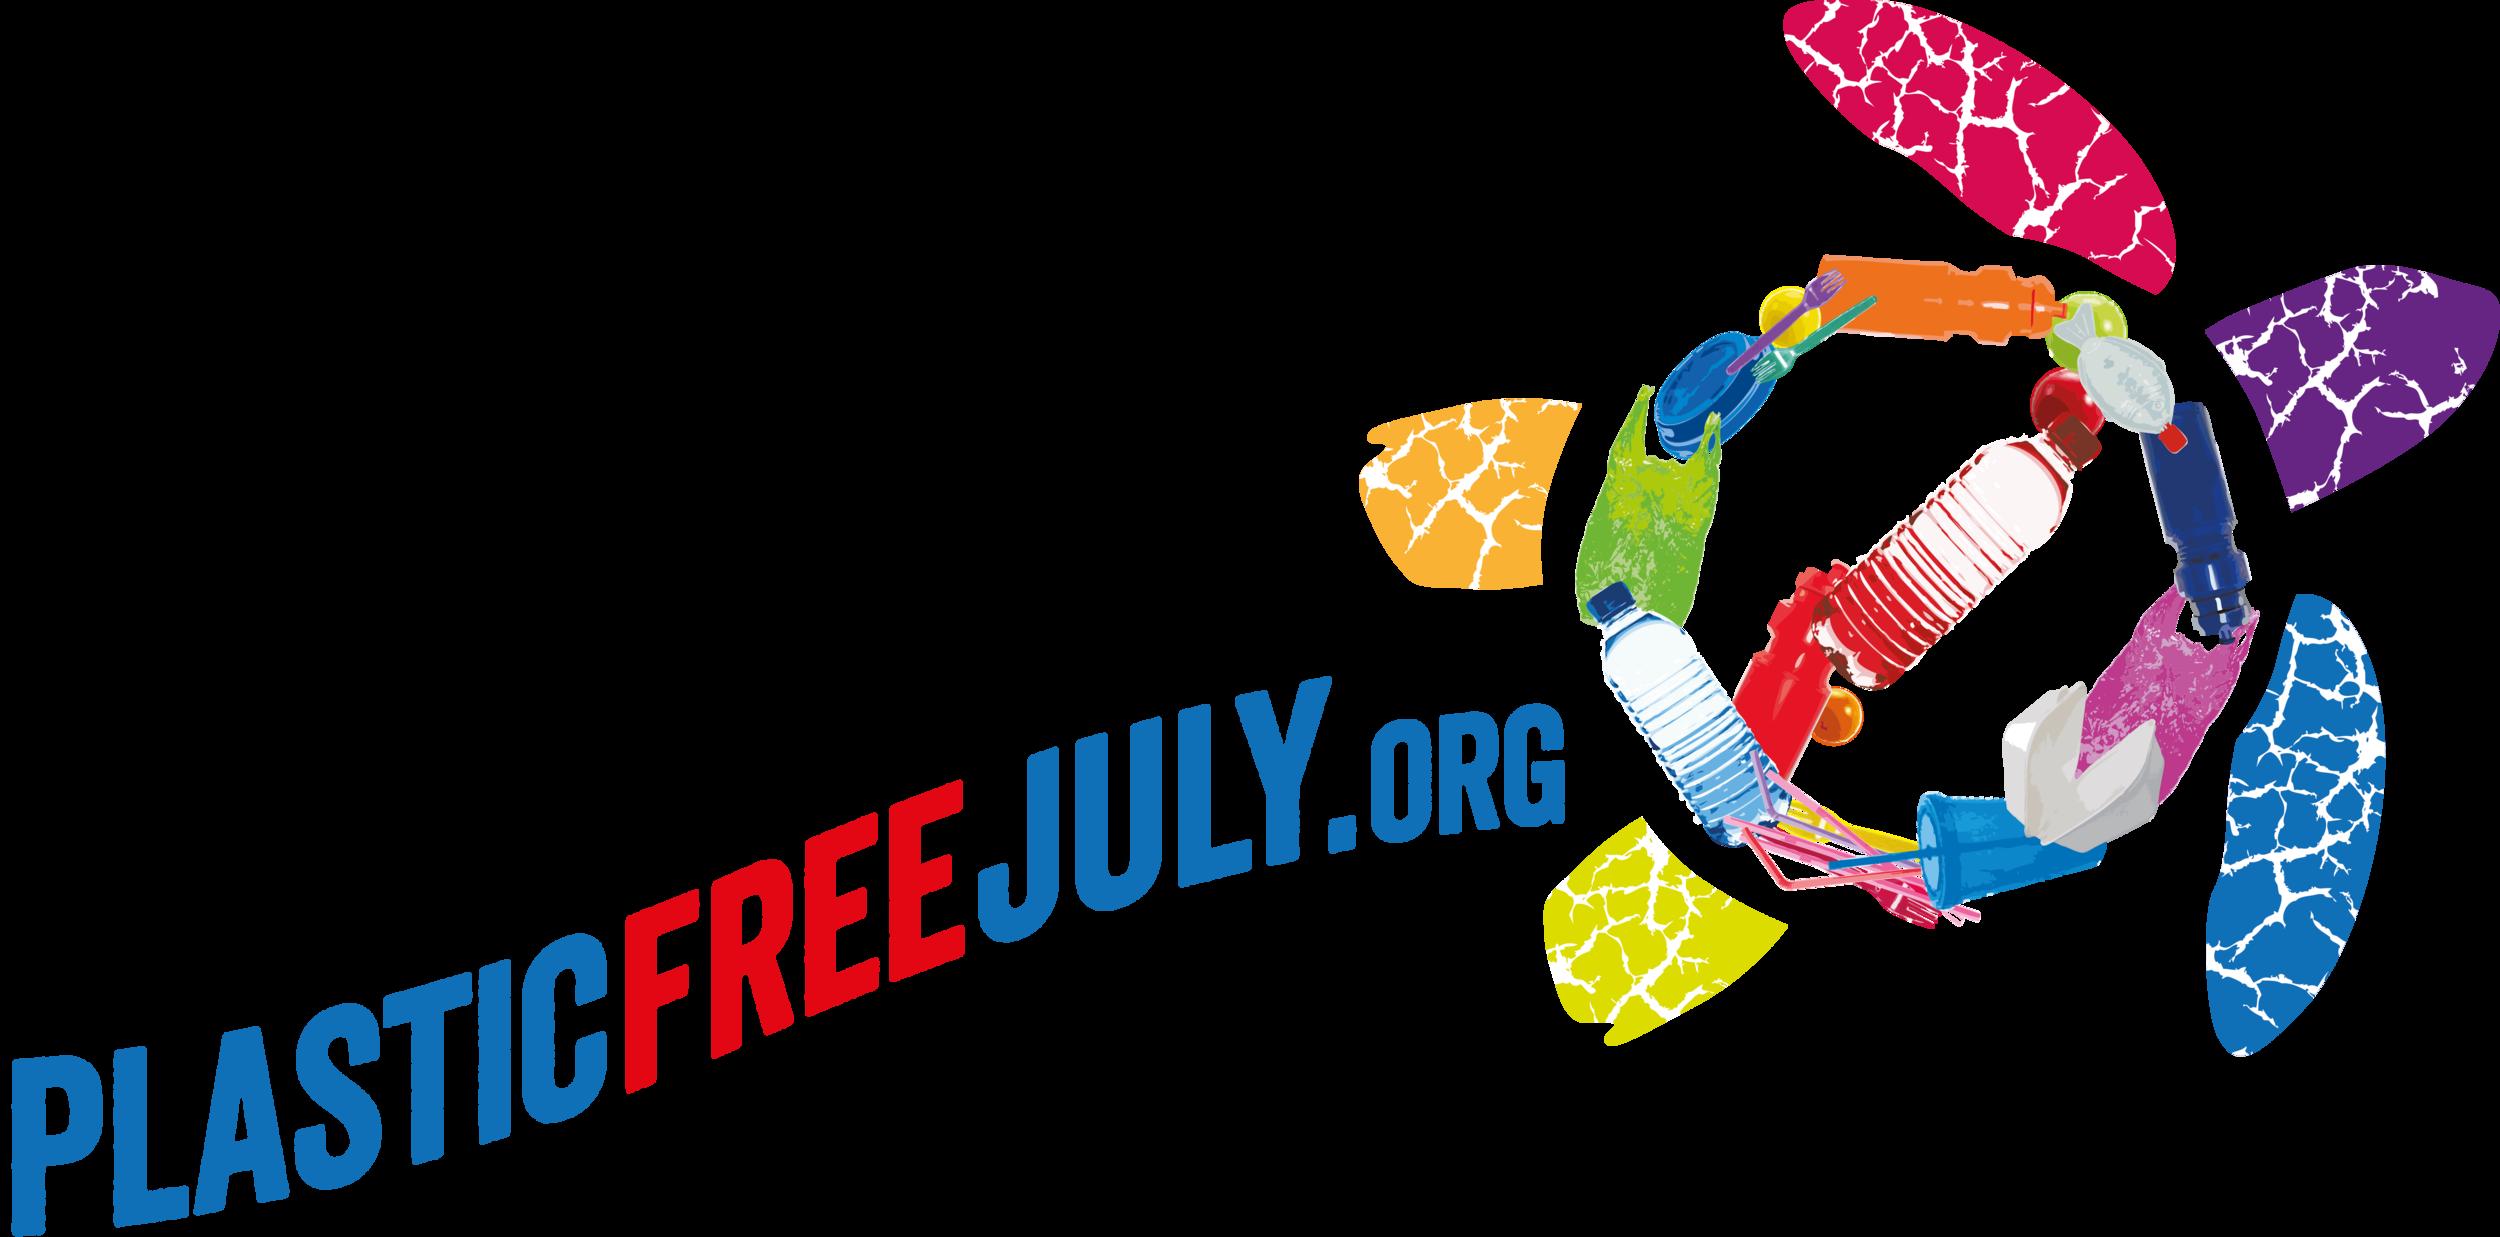 plastic-free-july-challenge